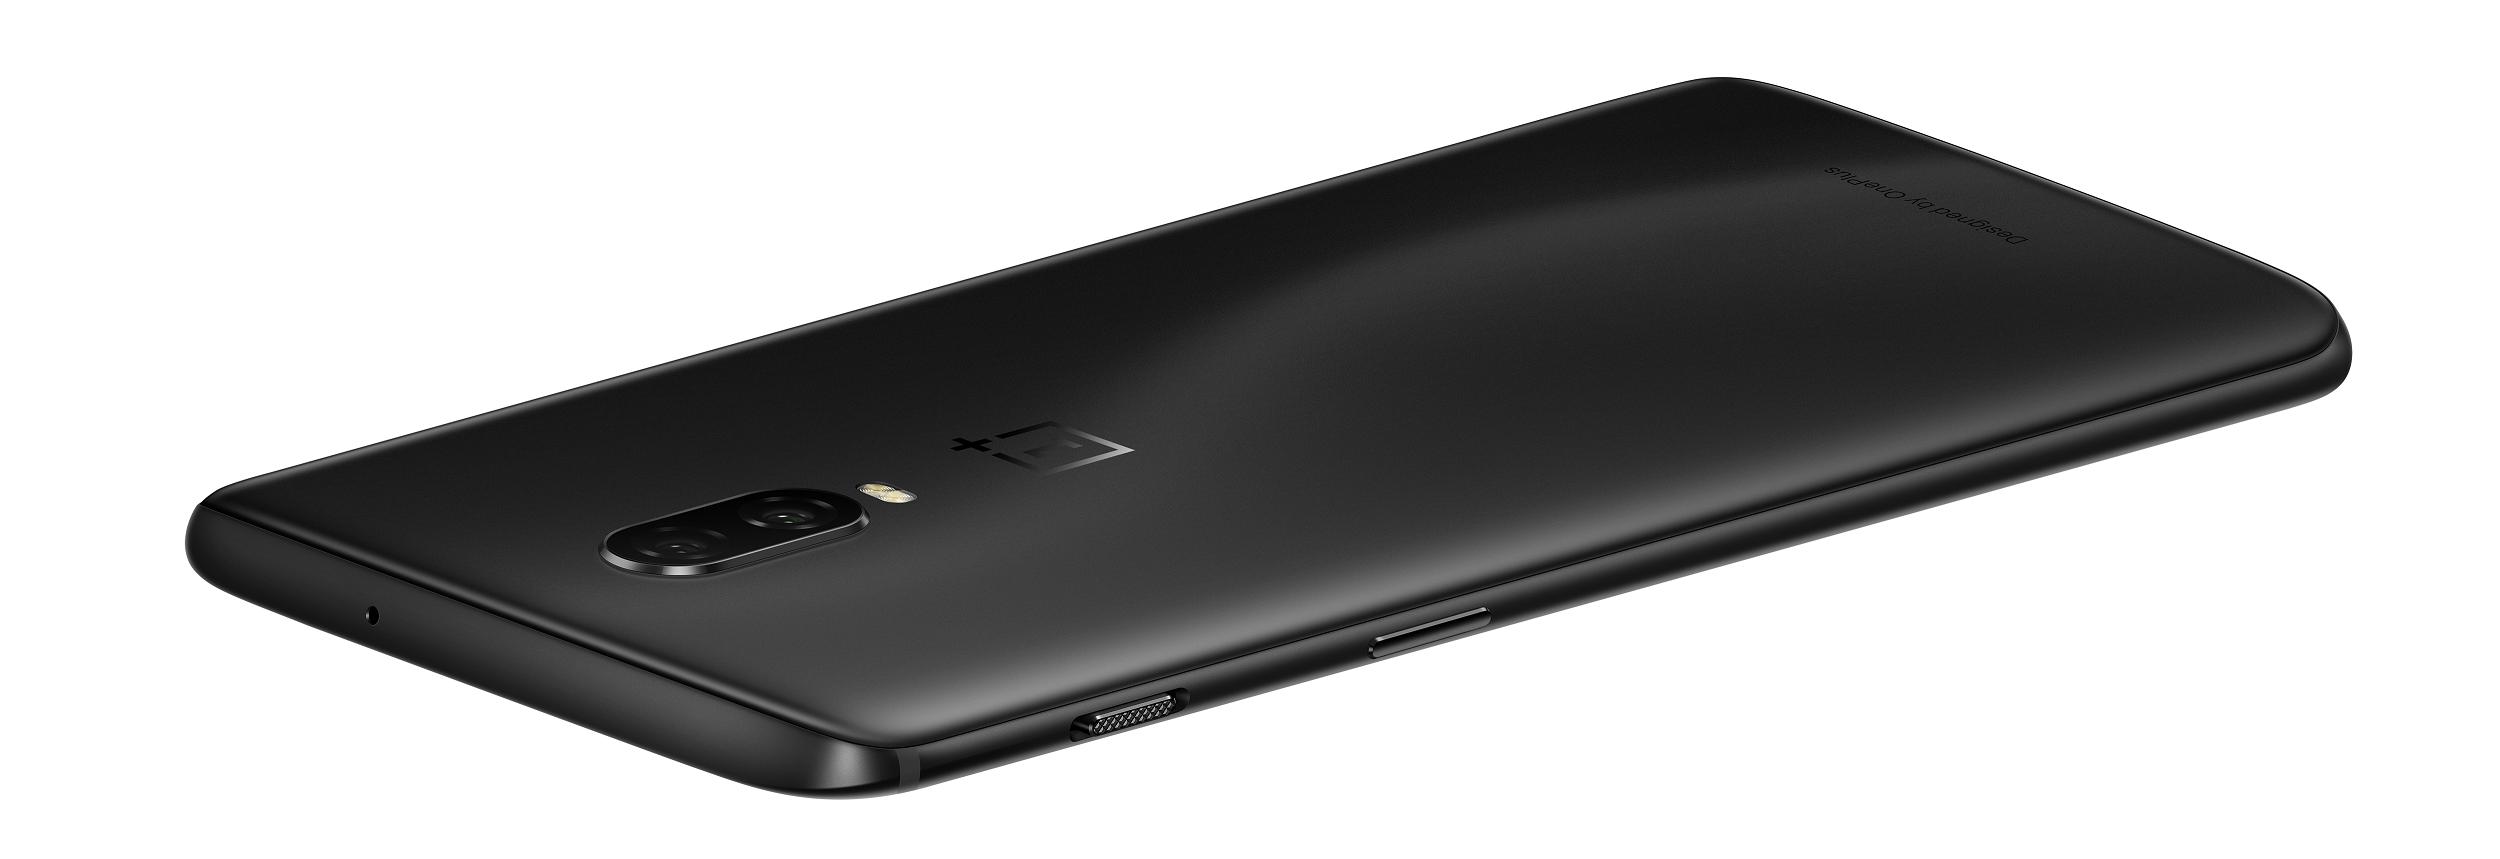 OnePlus 6T - אותה גברת בשינוי אדרת